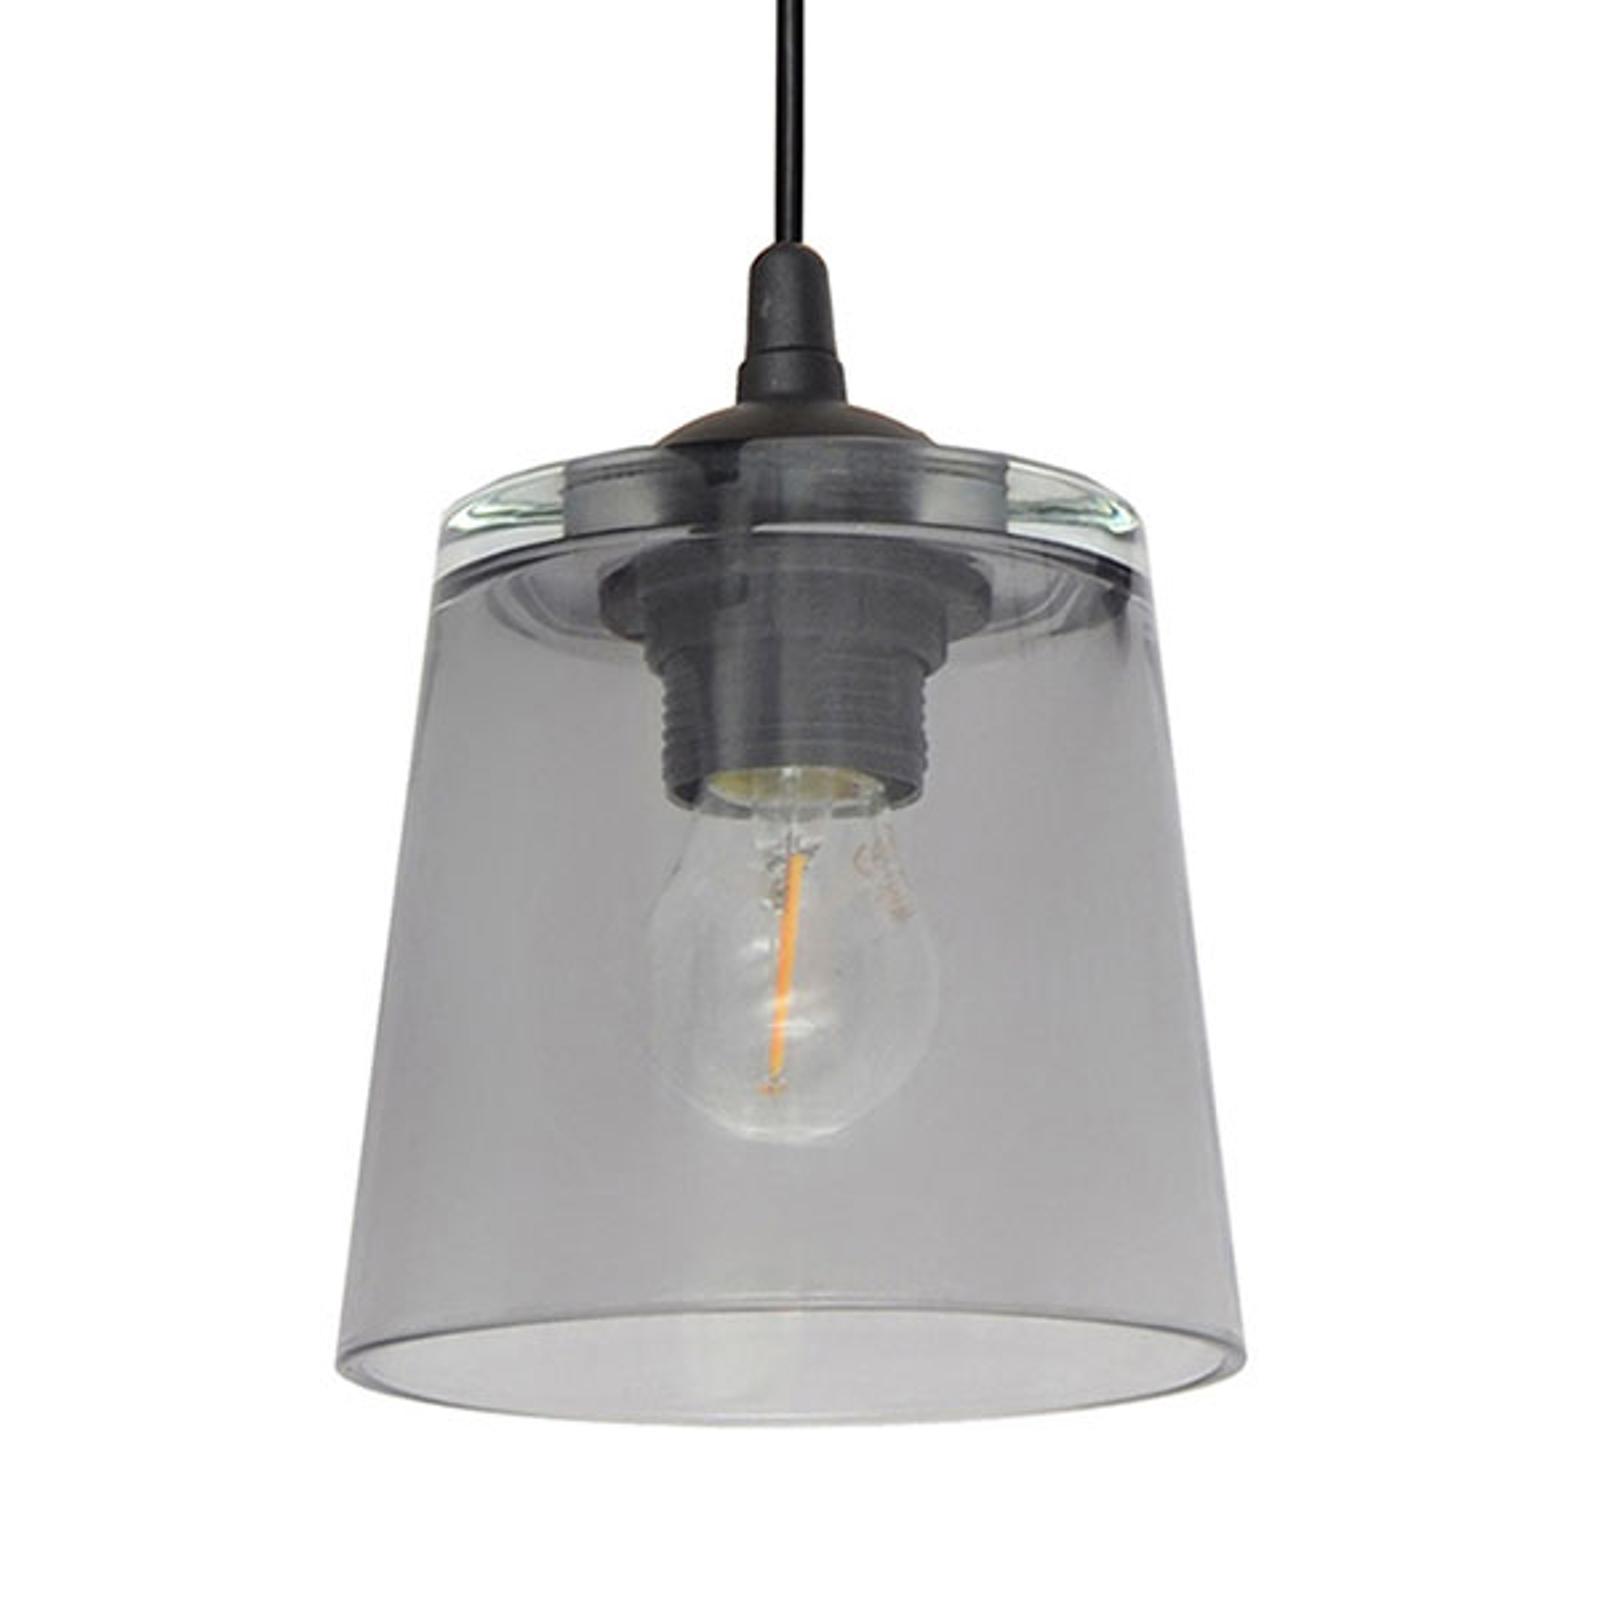 Hanglamp Lucea 1-lamp met glazen kap smoke